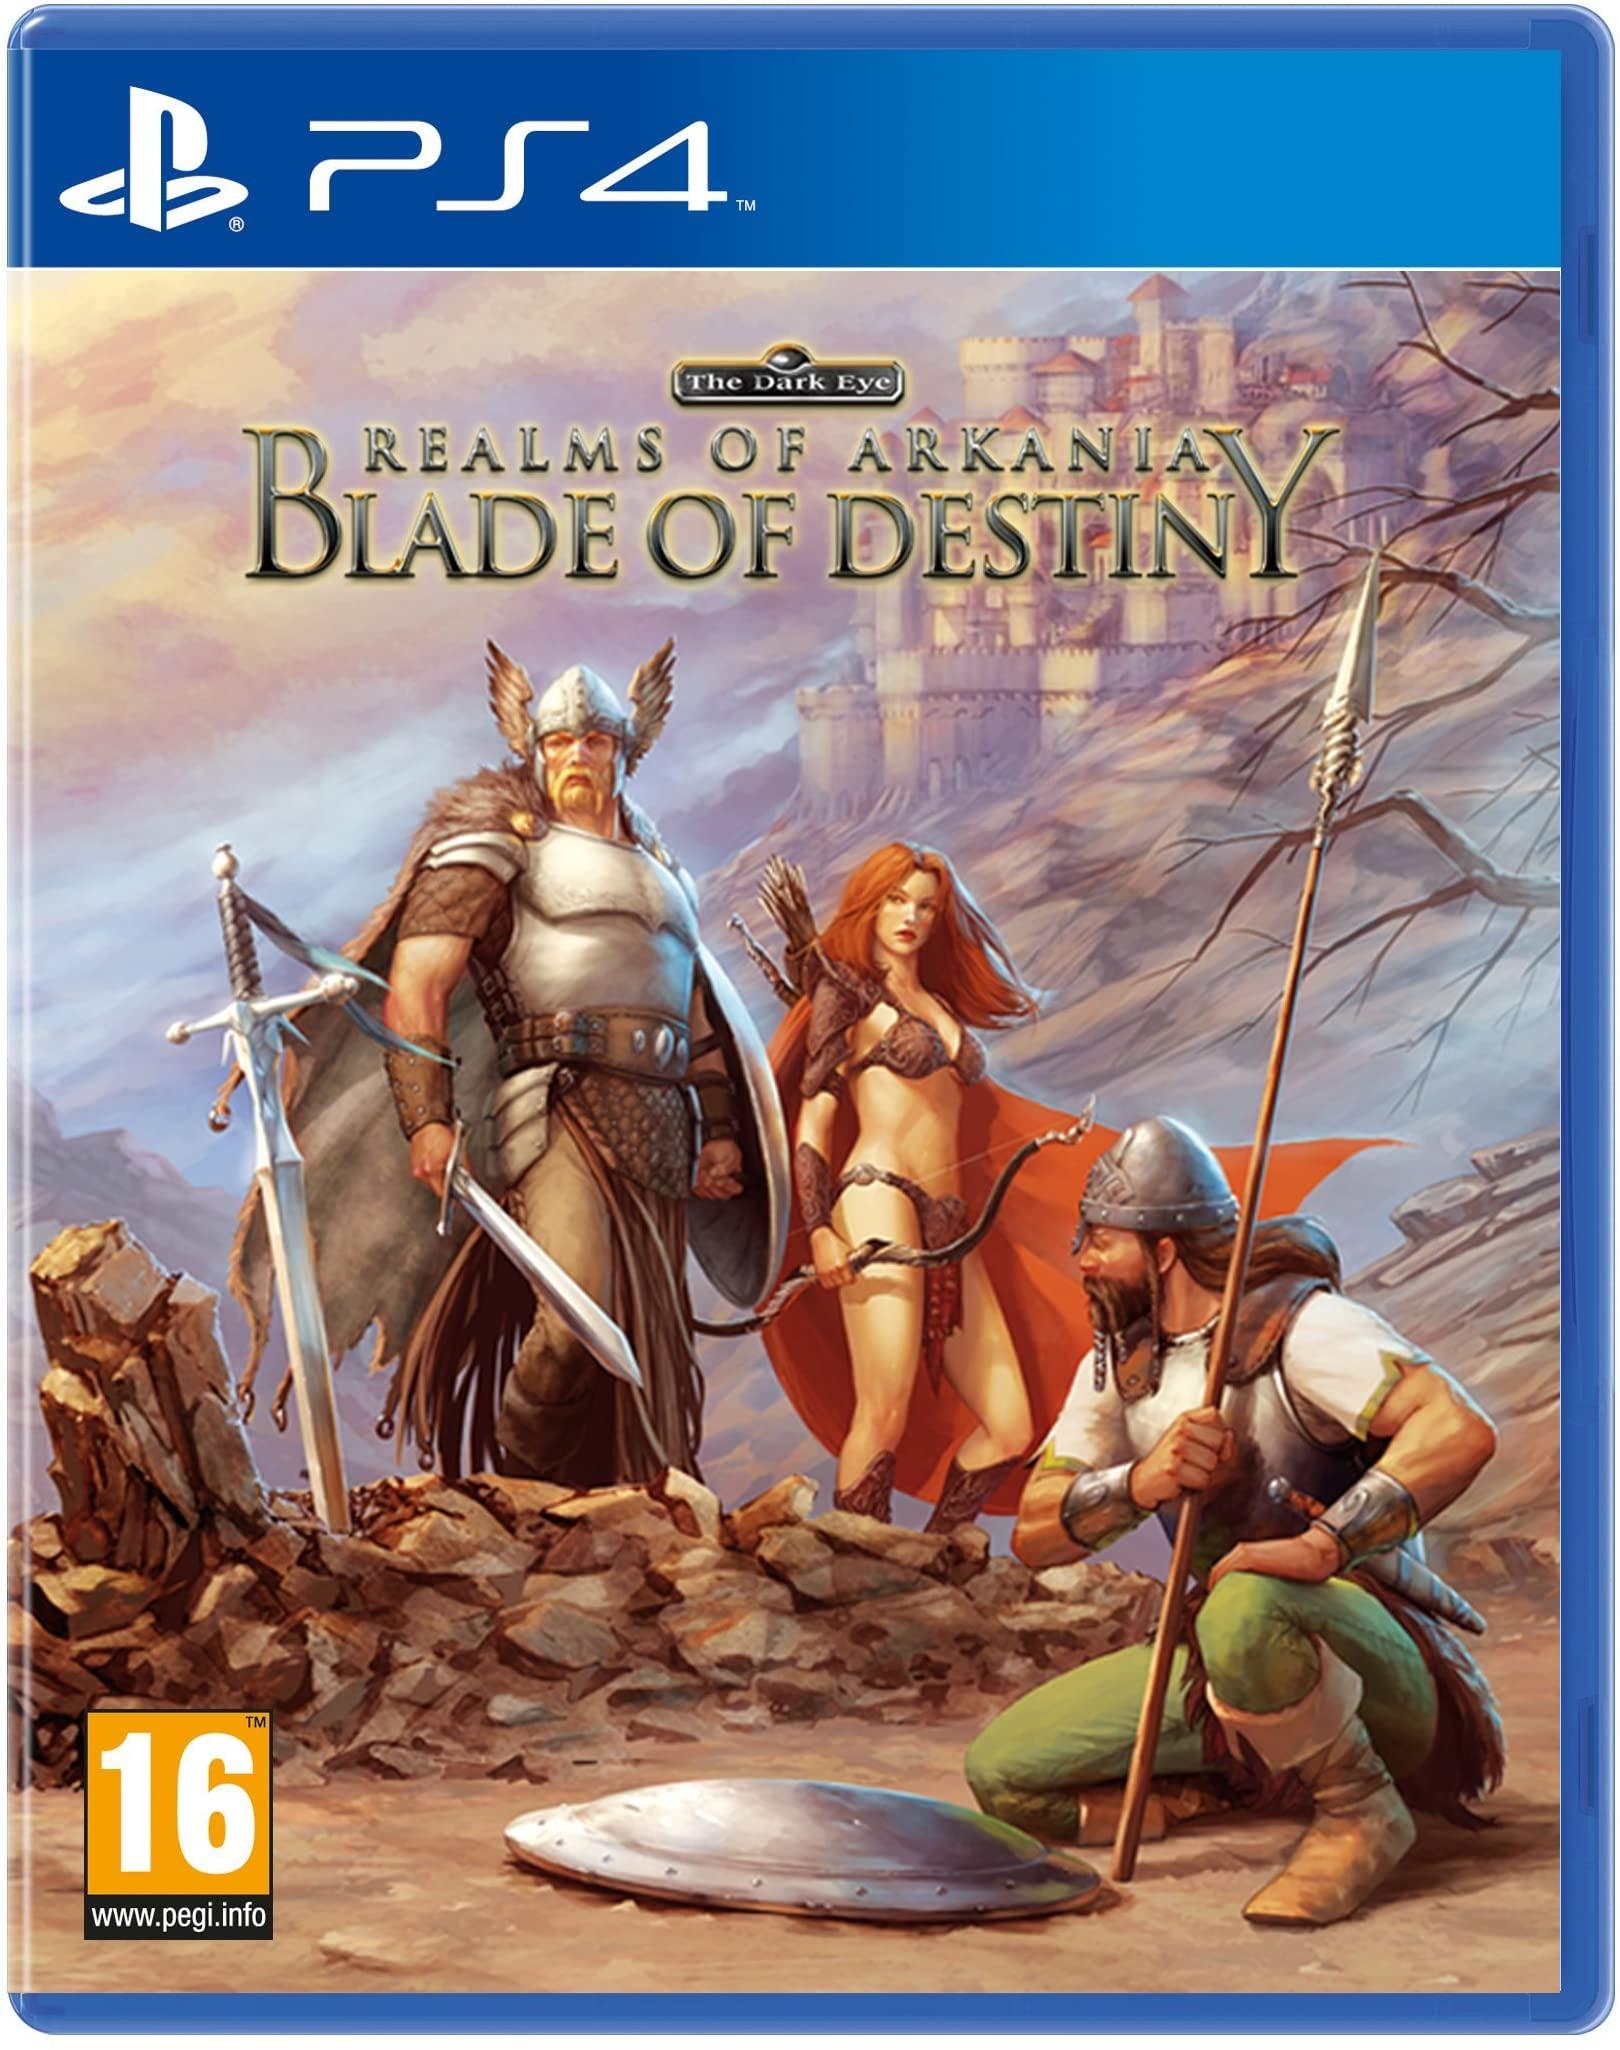 [PS4] Realms of Arkania - Blade of Destiny (Amazon Prime)